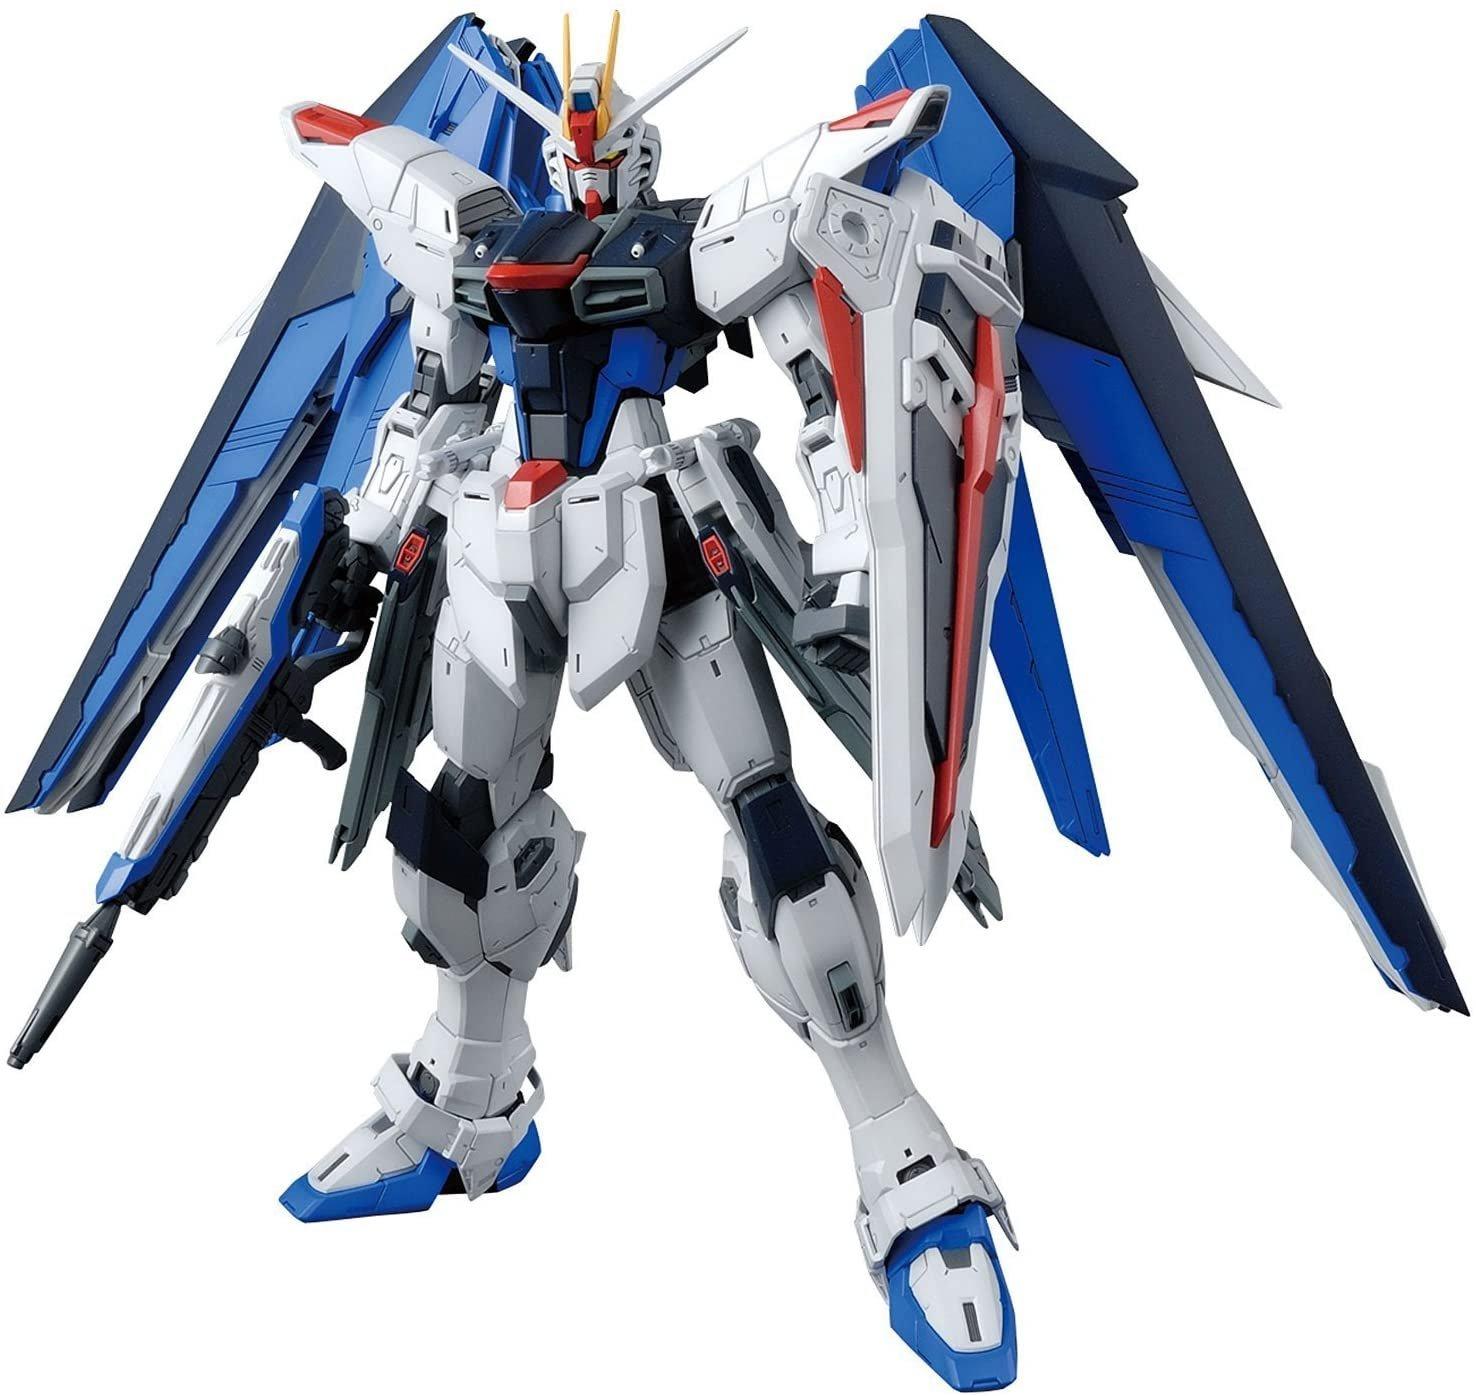 Gundam Freedom Ver 2.0